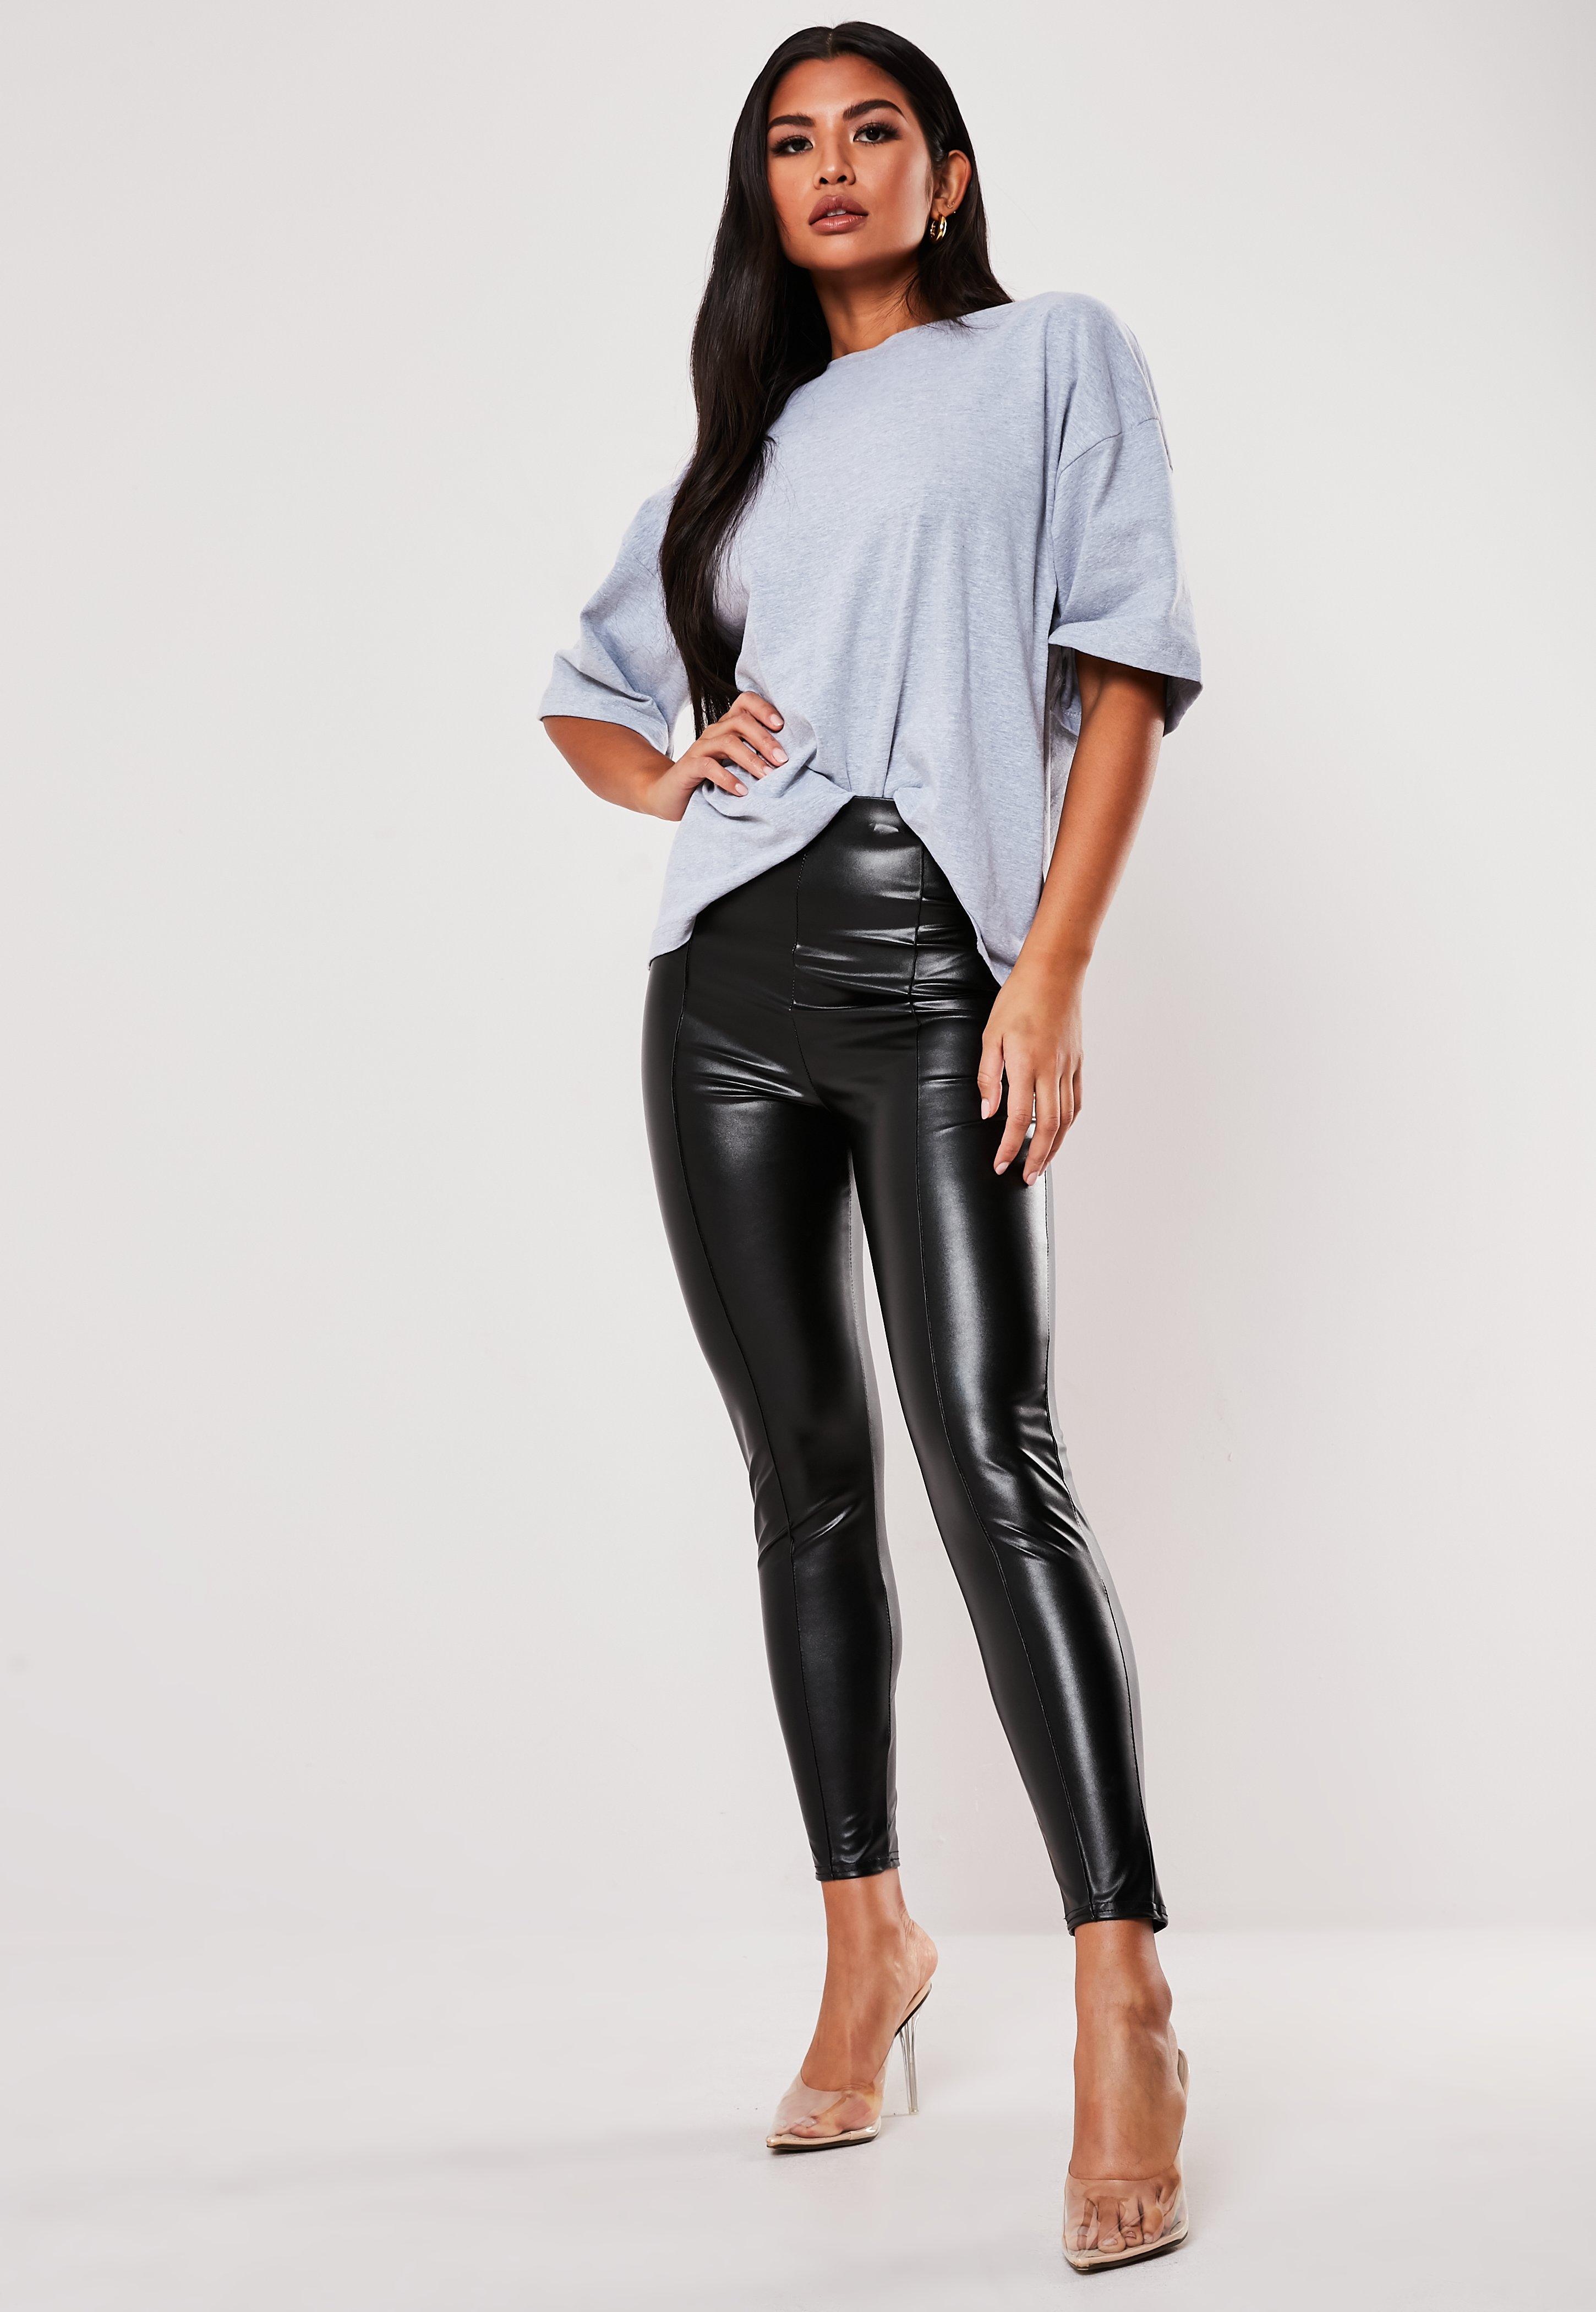 c9b5b71b98c70 Leather Pants, Womens Faux Leather Pants - Missguided